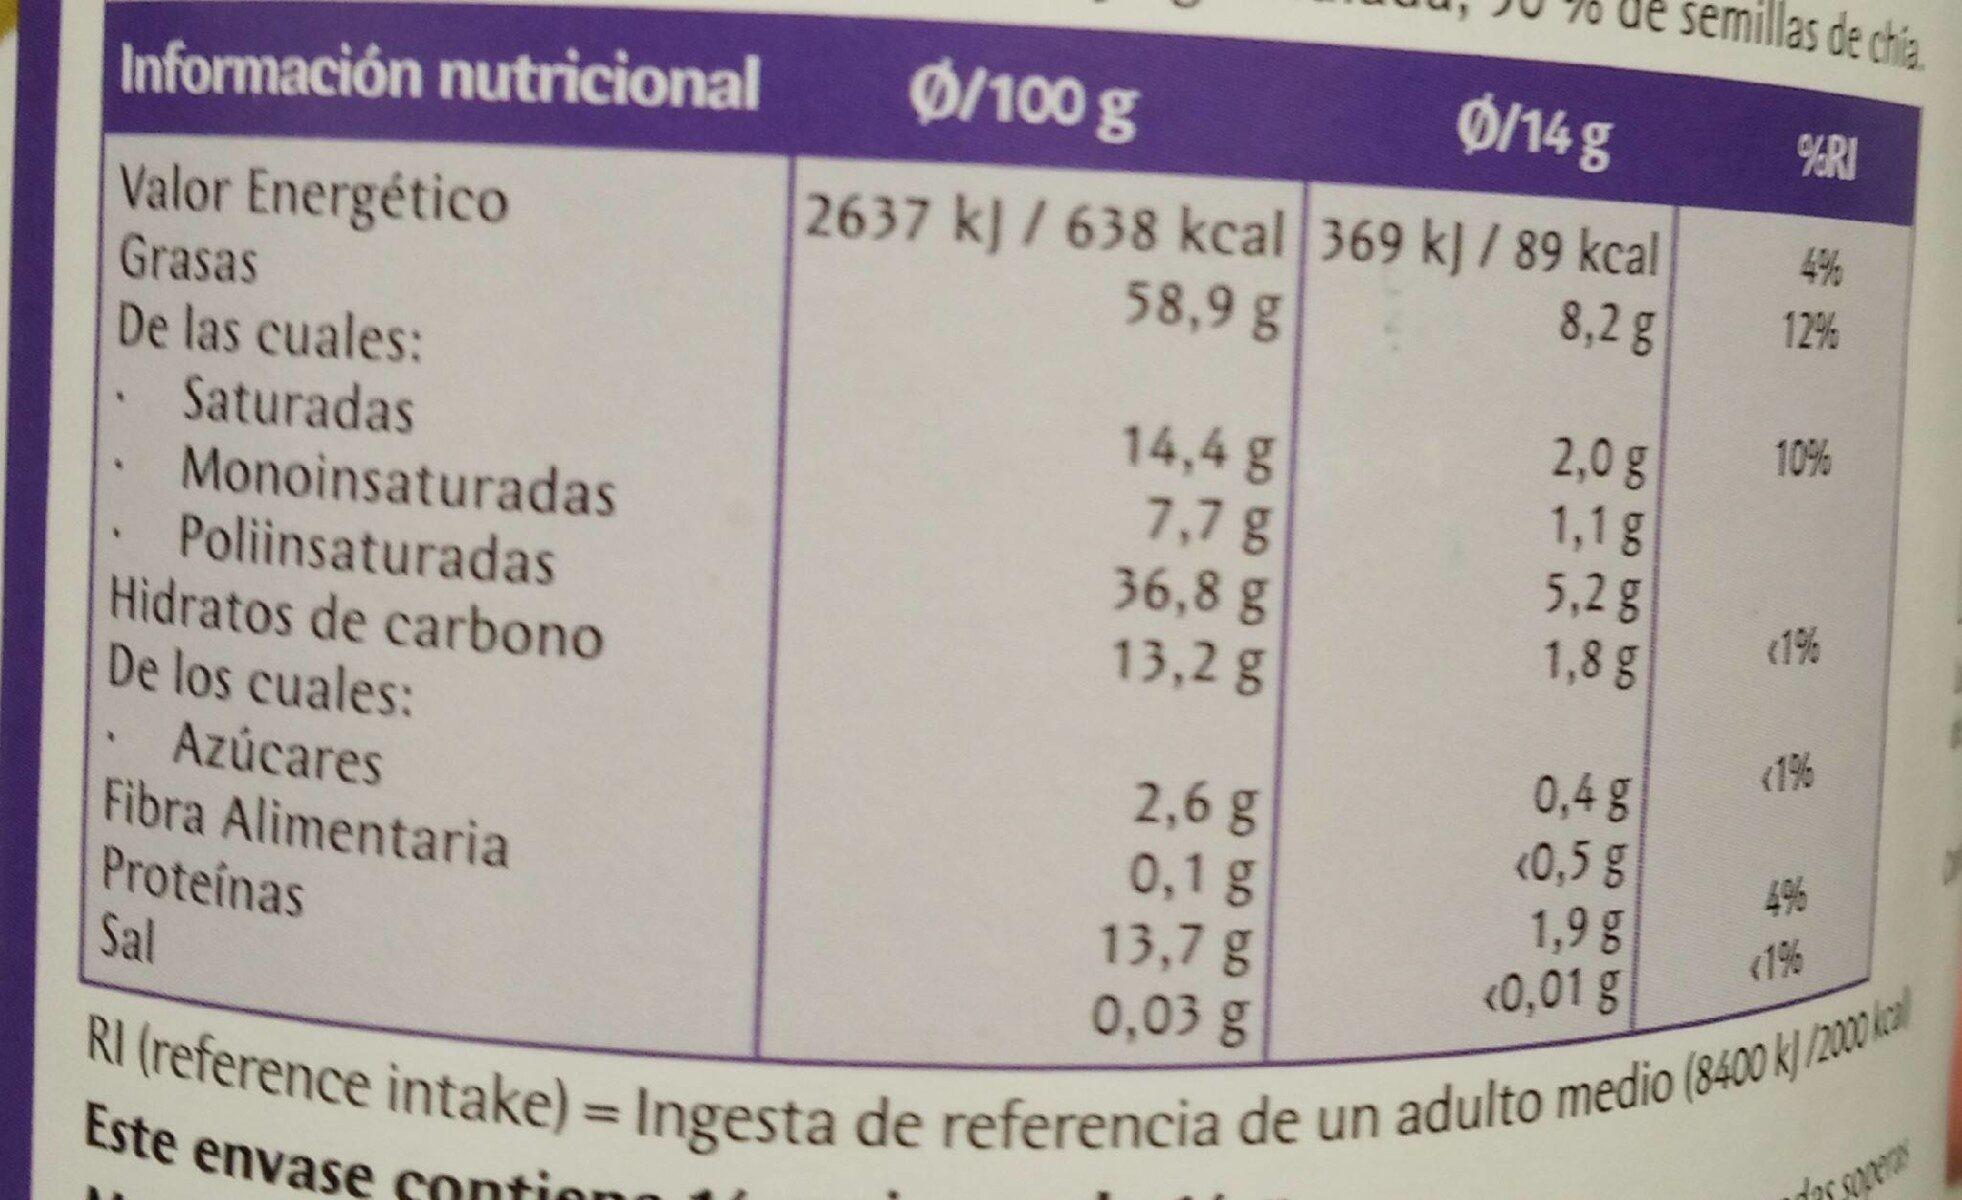 Lecitina de soja - Información nutricional